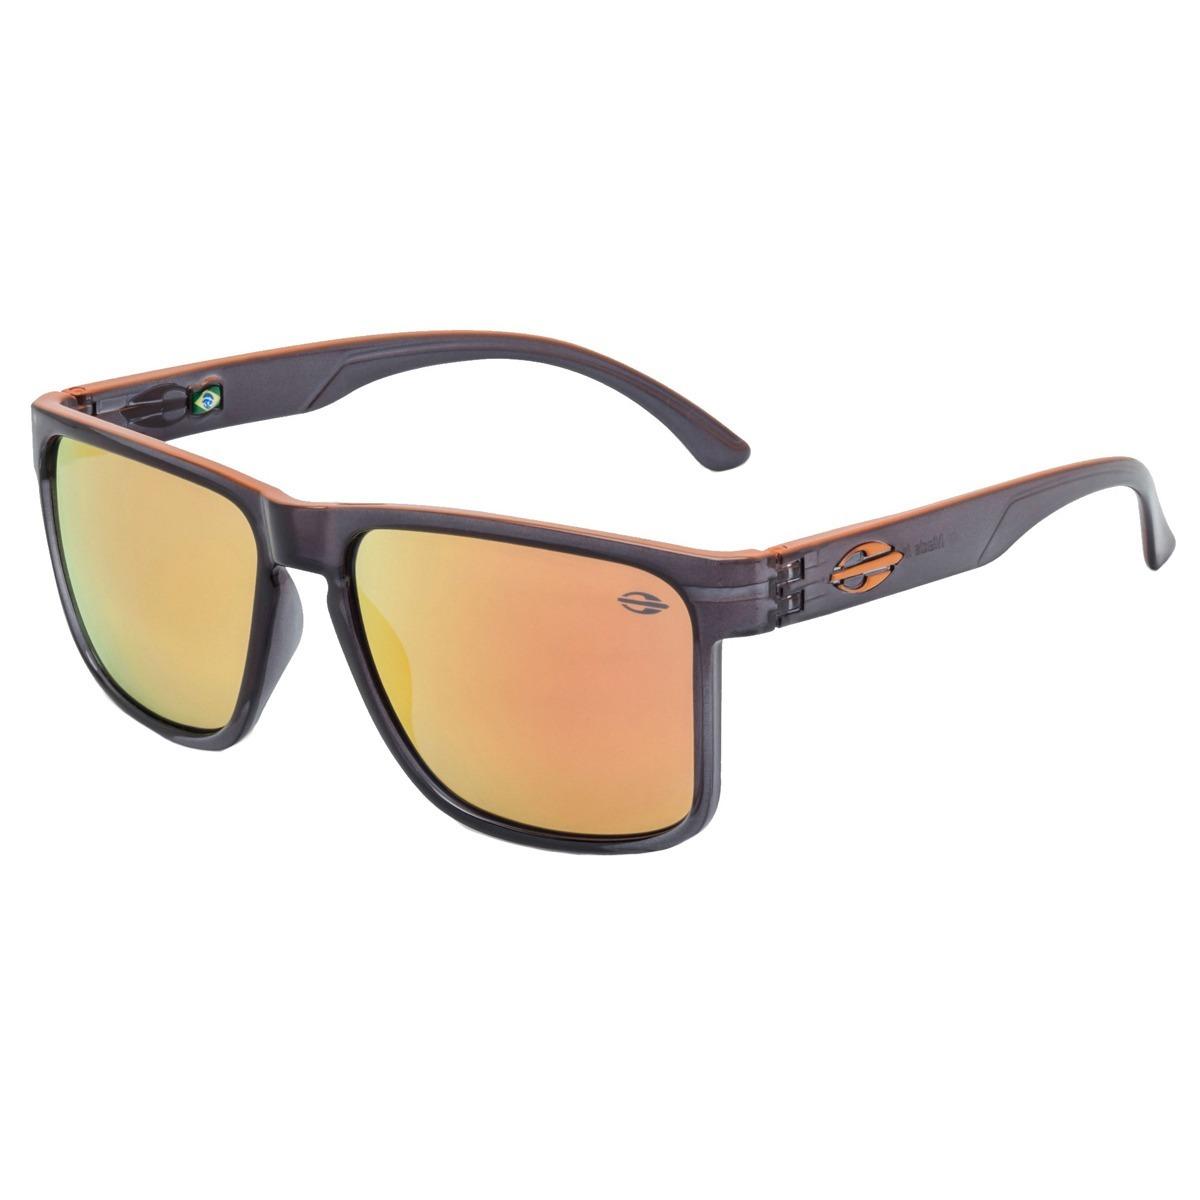 c7238bb9c oculos sol espelhado mormaii monterey original fume laranja. Carregando  zoom.